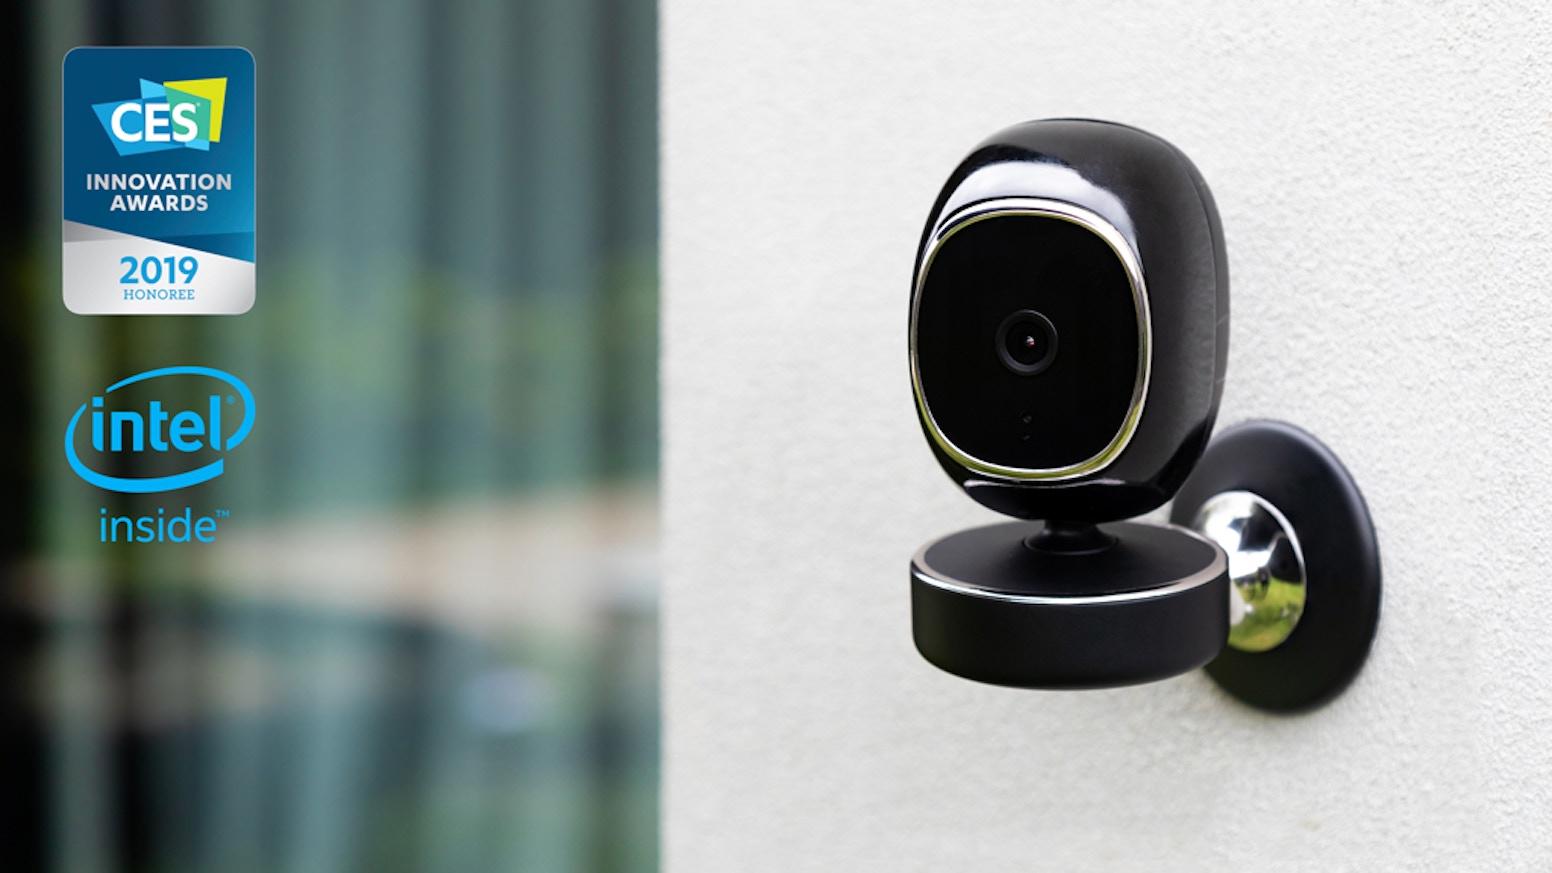 AI Facial recognition | No false alert | 1080P | Starlight vision | Wifi | No Monthly Fee | Local storage | 2-way audio